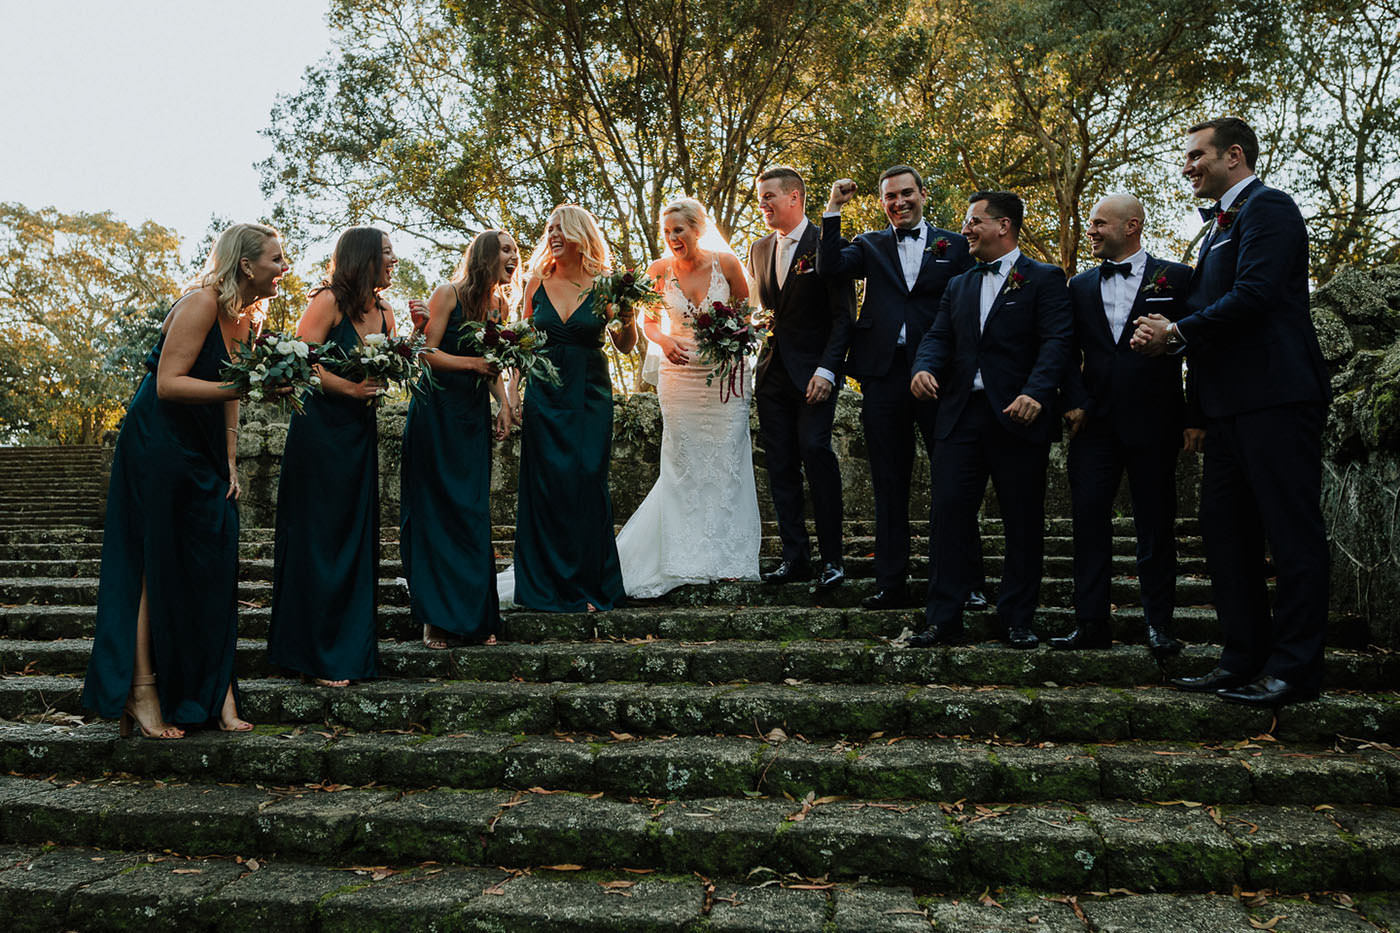 wedding_photographer_nz-00104.jpg